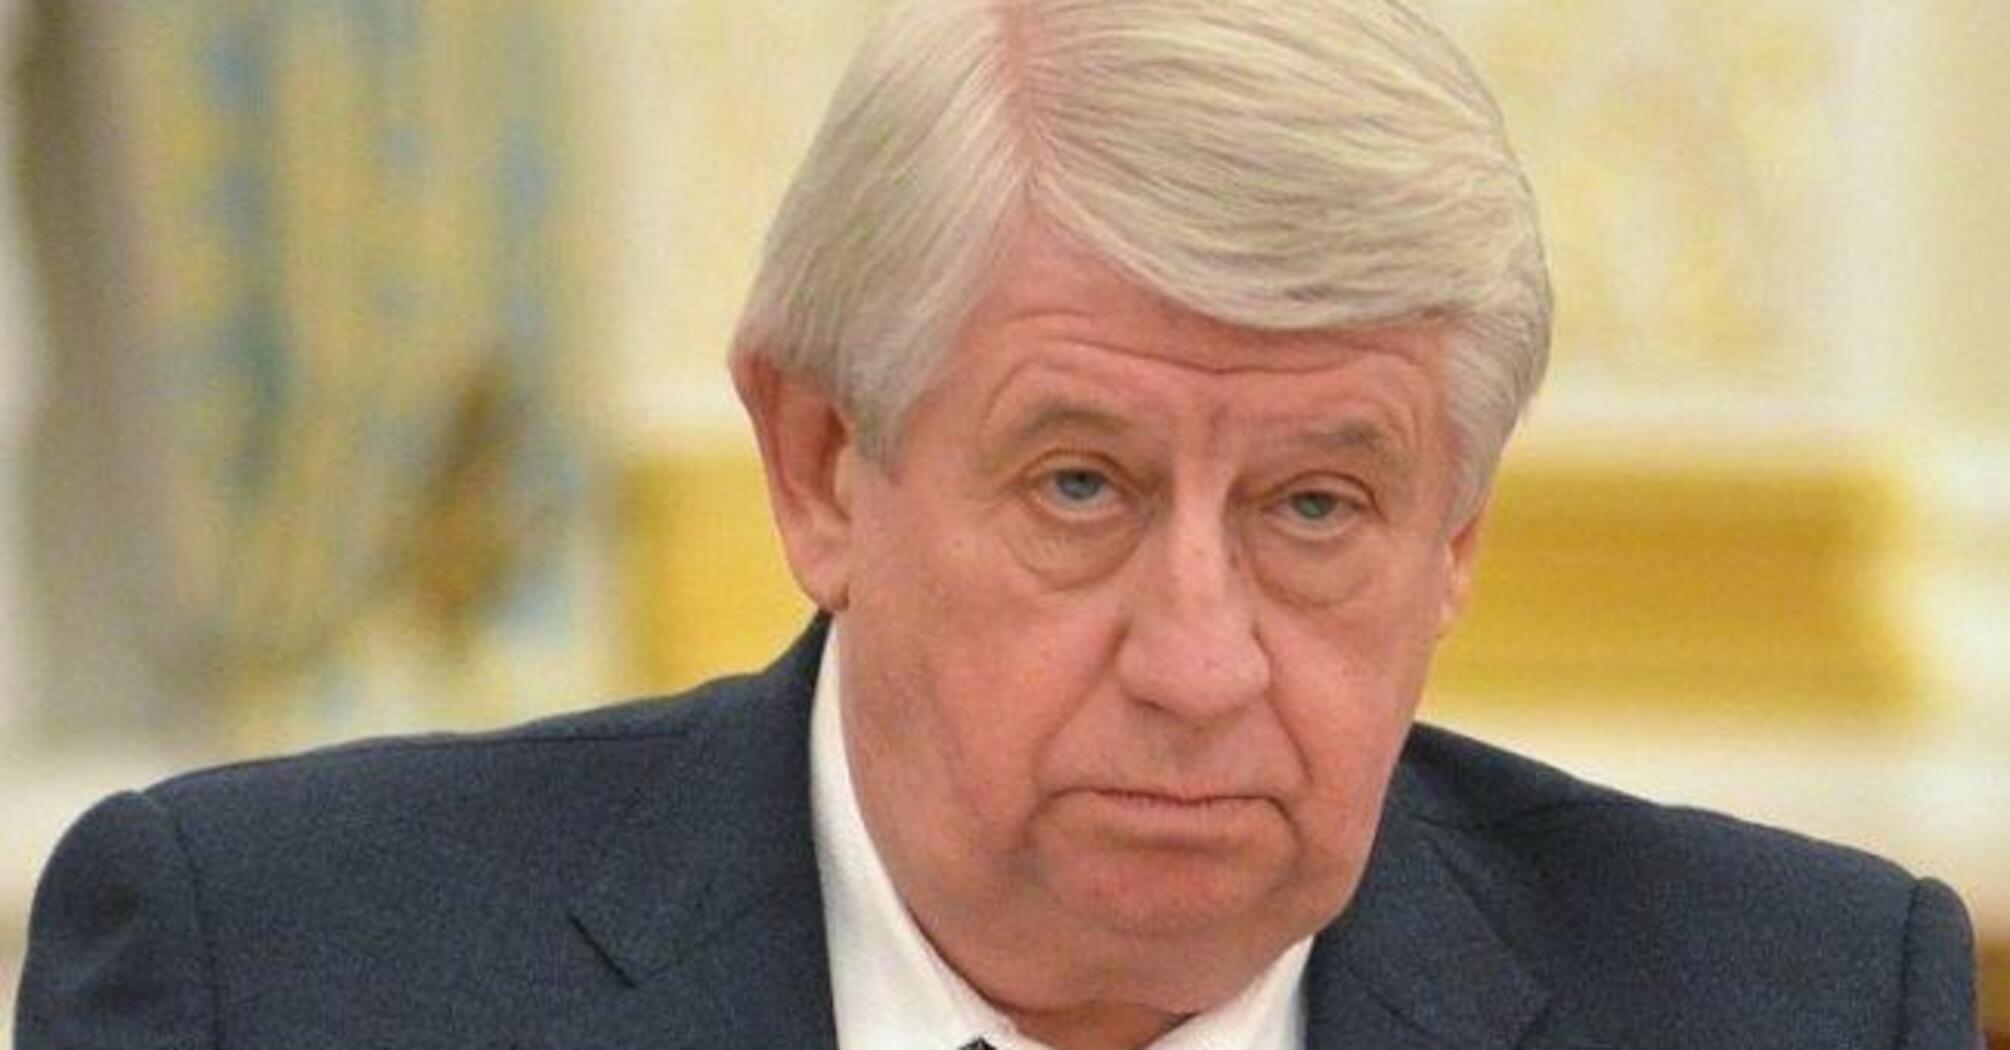 ГБР открыло дело о давлении Джозефа Байдена на Шокина